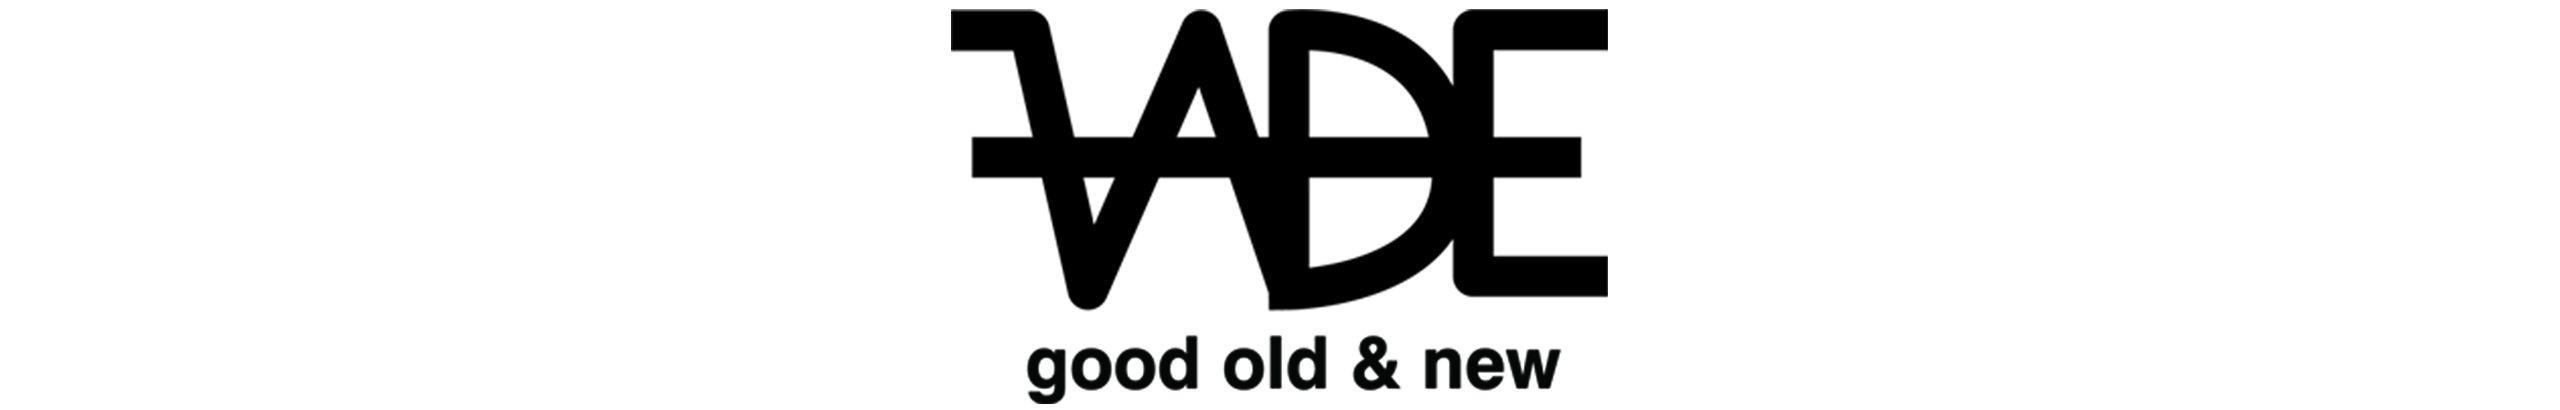 VADE-YOYOJPN : YoYo news & information